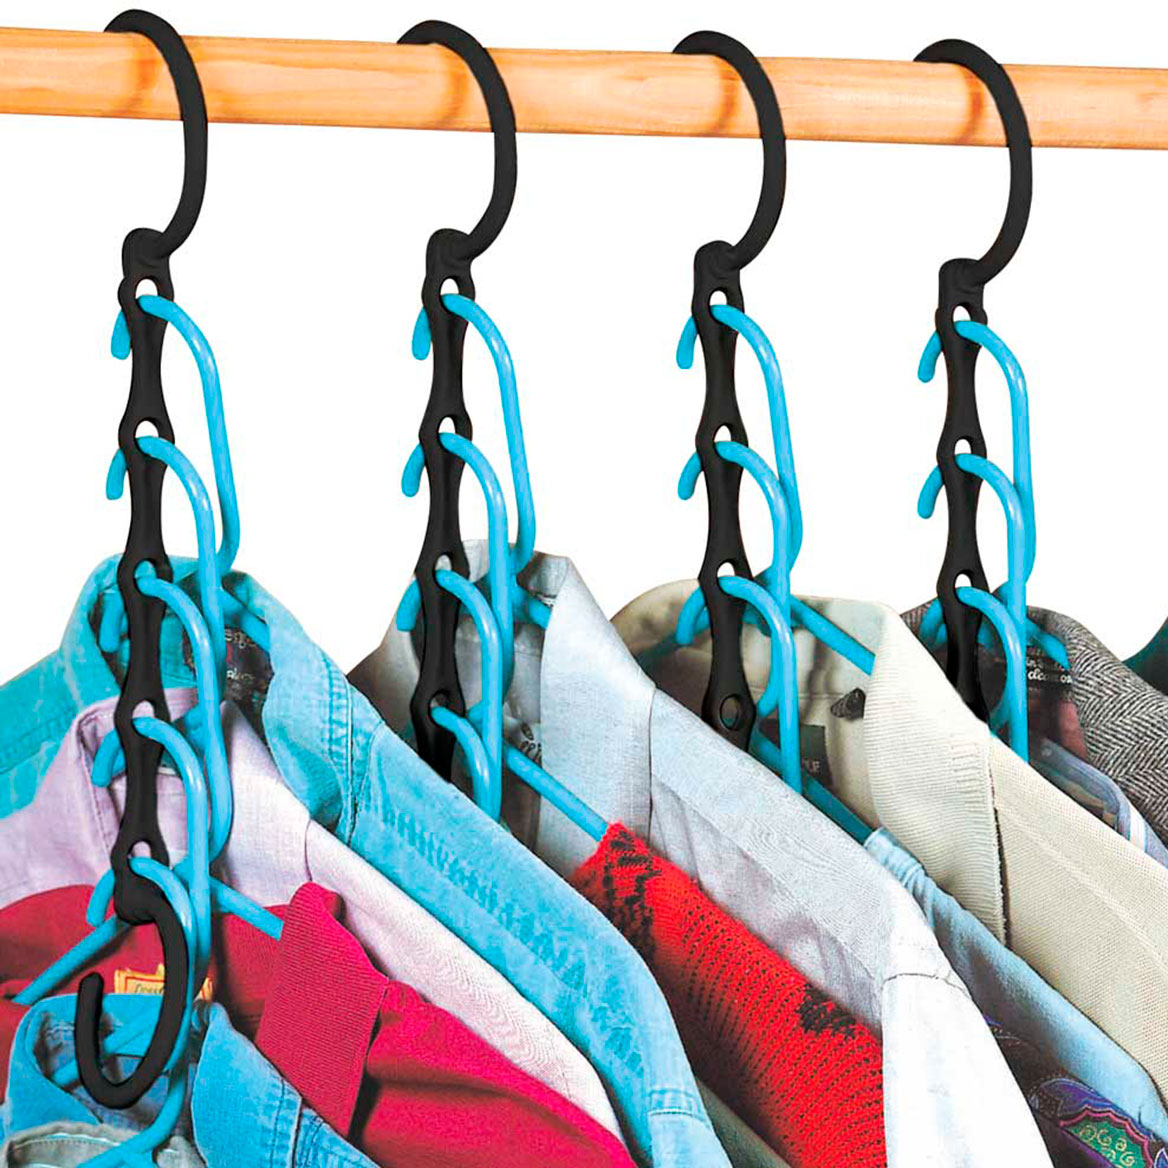 Closet Organizer Set of 6-303522